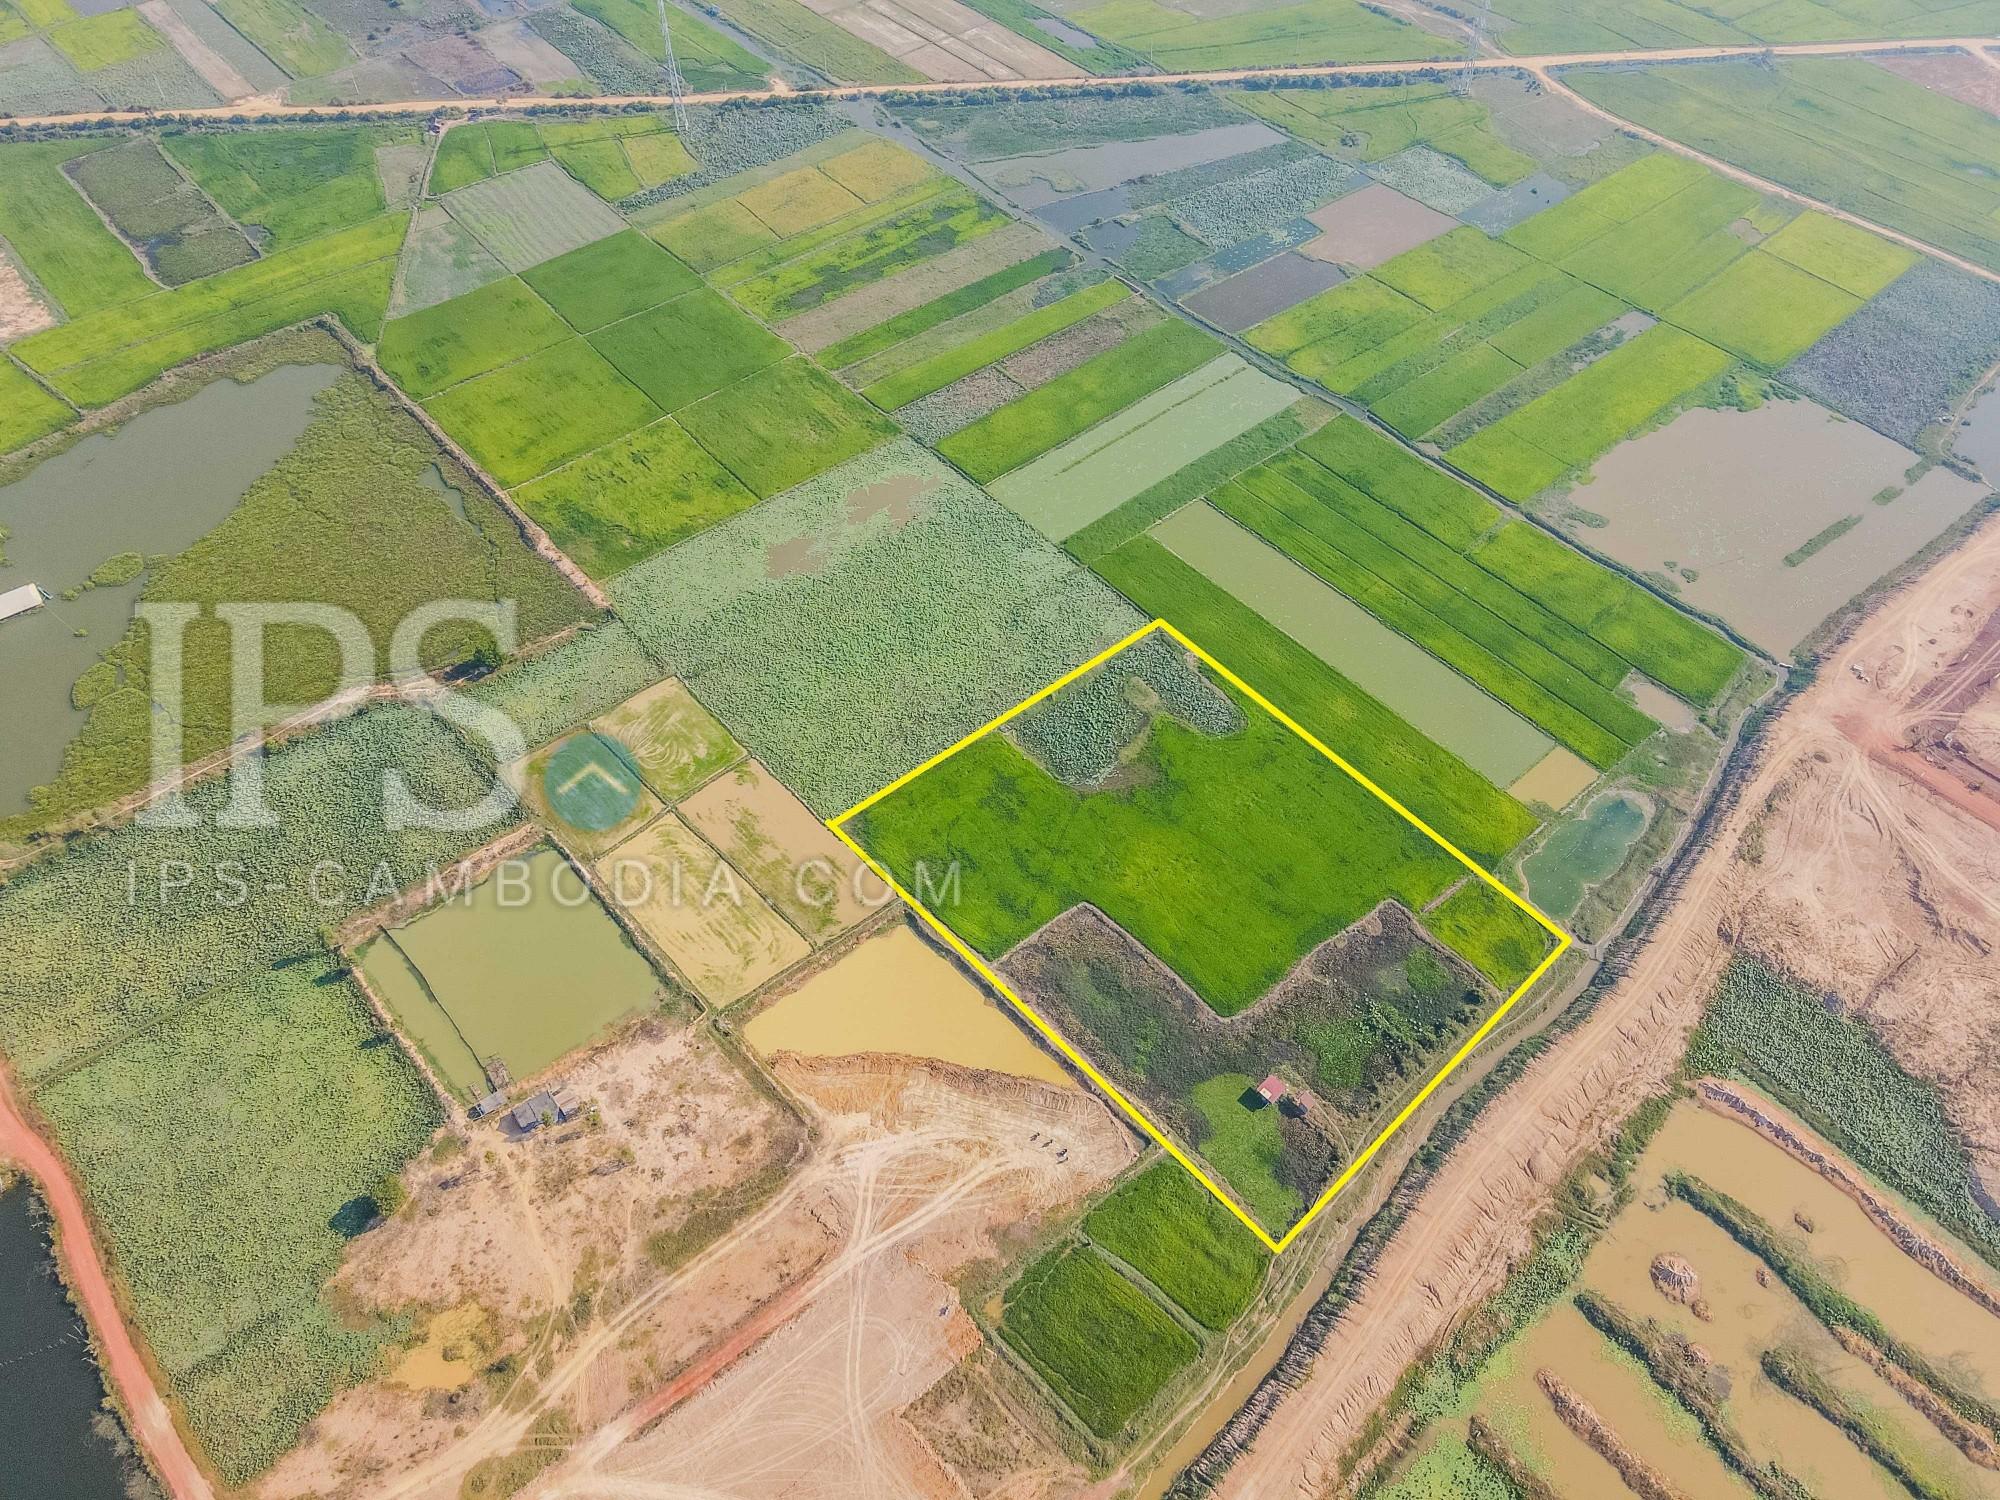 13000 Sqm Land For Sale - Sangkat Siem Reap, Siem Reap